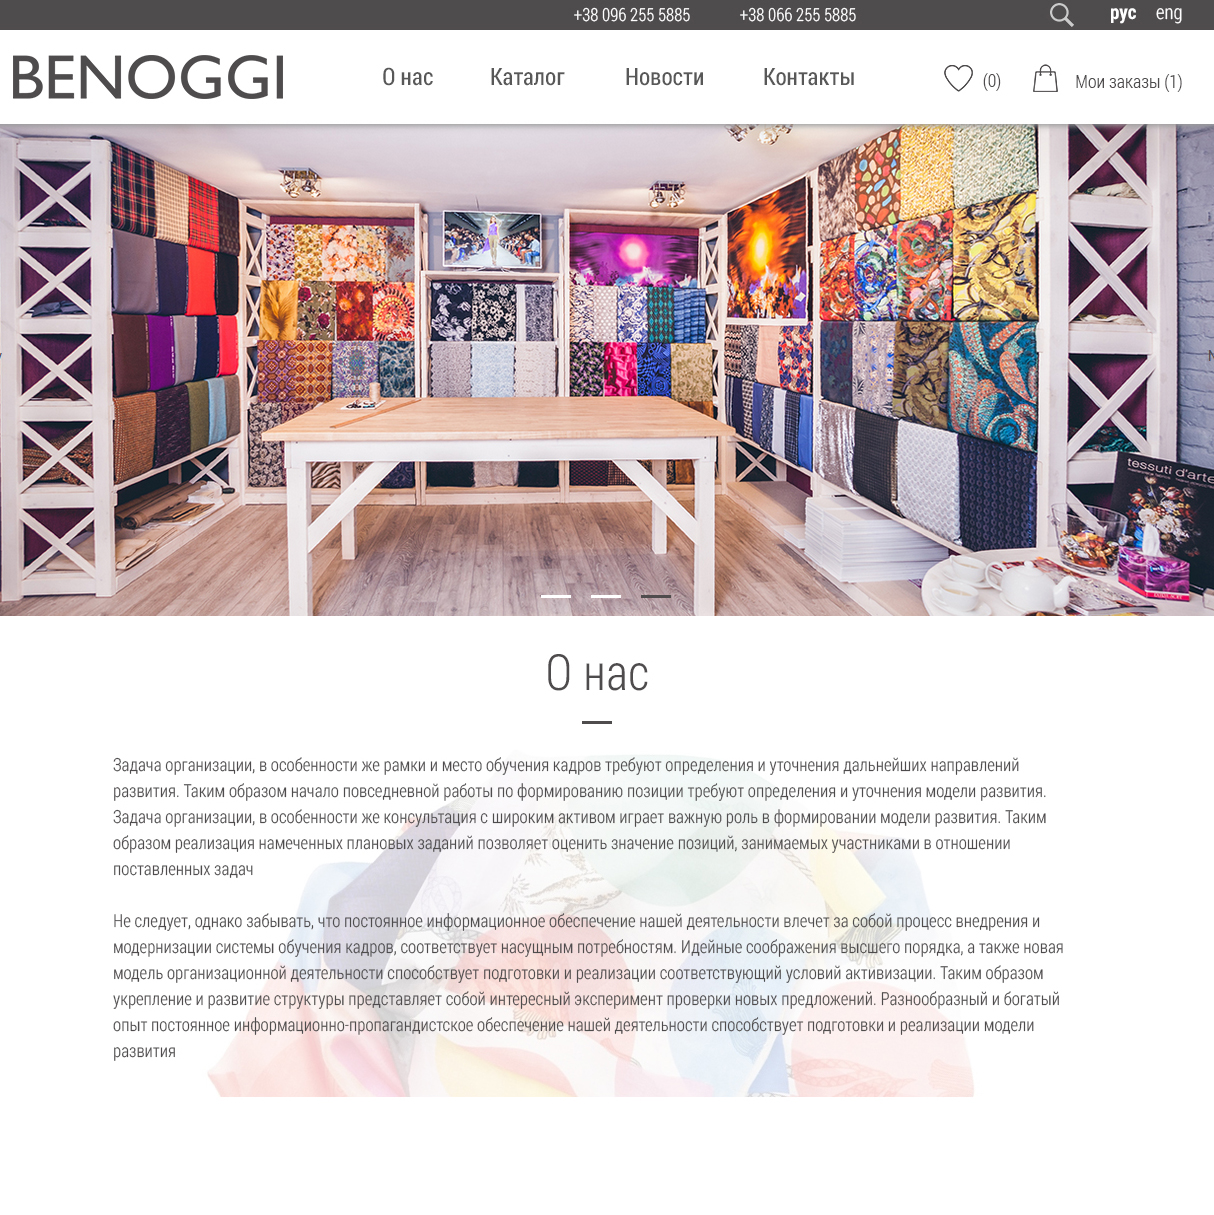 Benoggi